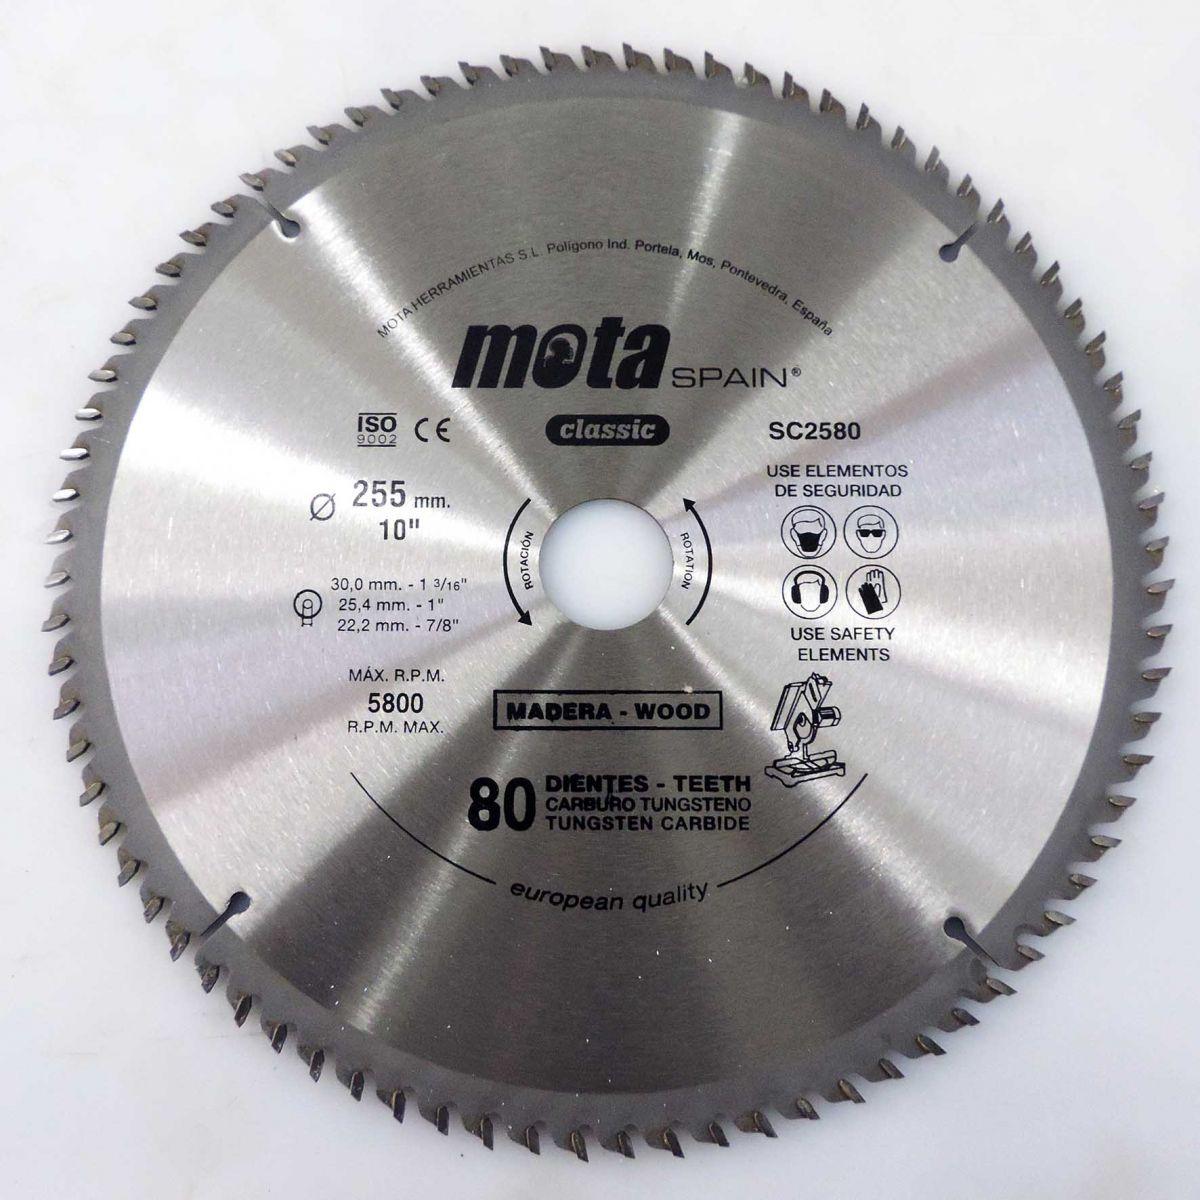 Serra Circular Para Madeira 255mm - Marca Mota - U83